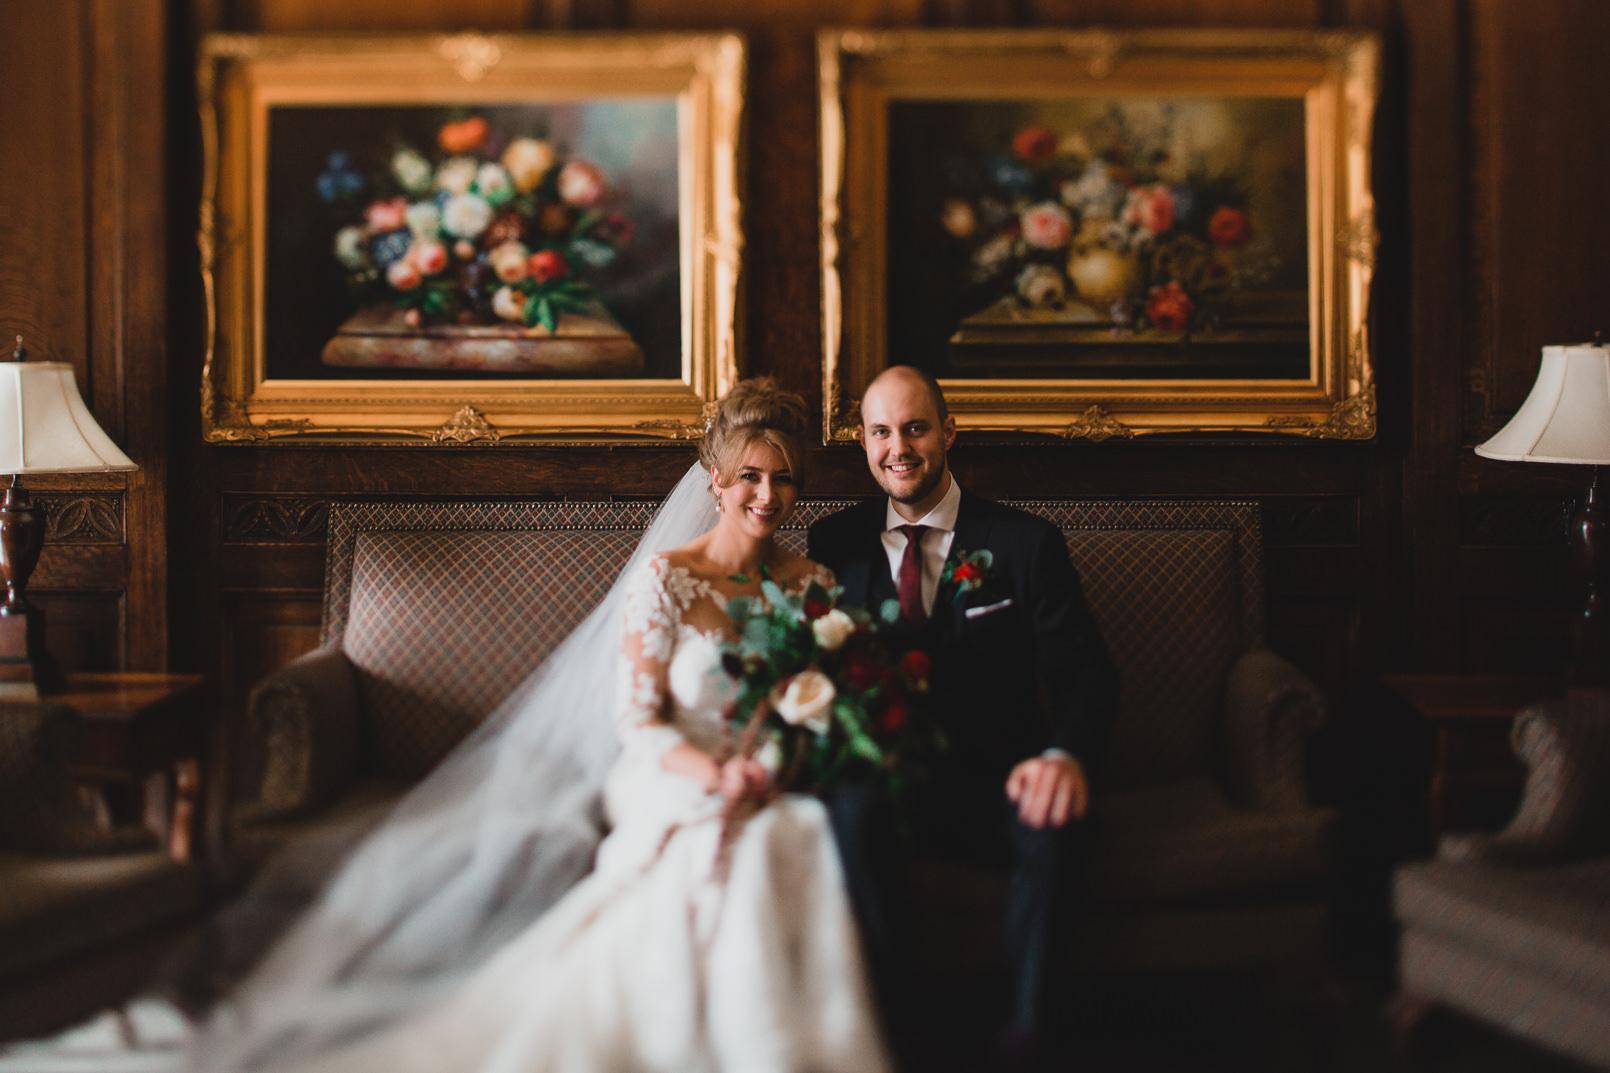 001-Jonathan-Kuhn-Photography-Wedding-_mini.jpg